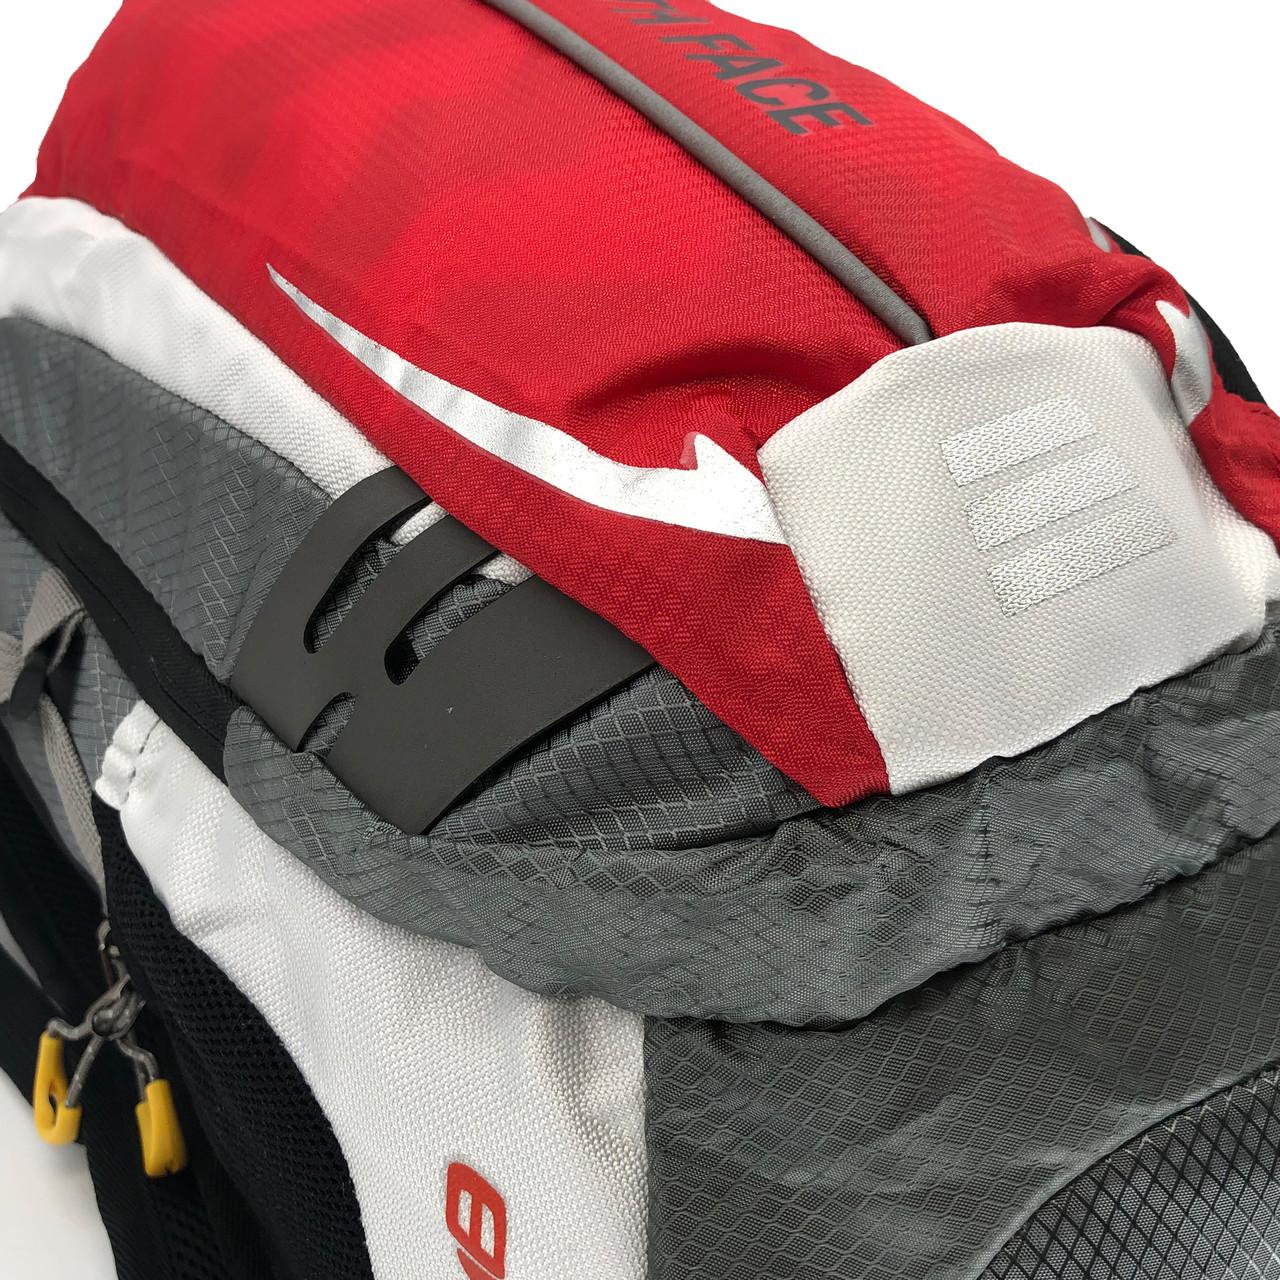 Спортивный рюкзак для бега - фото 5